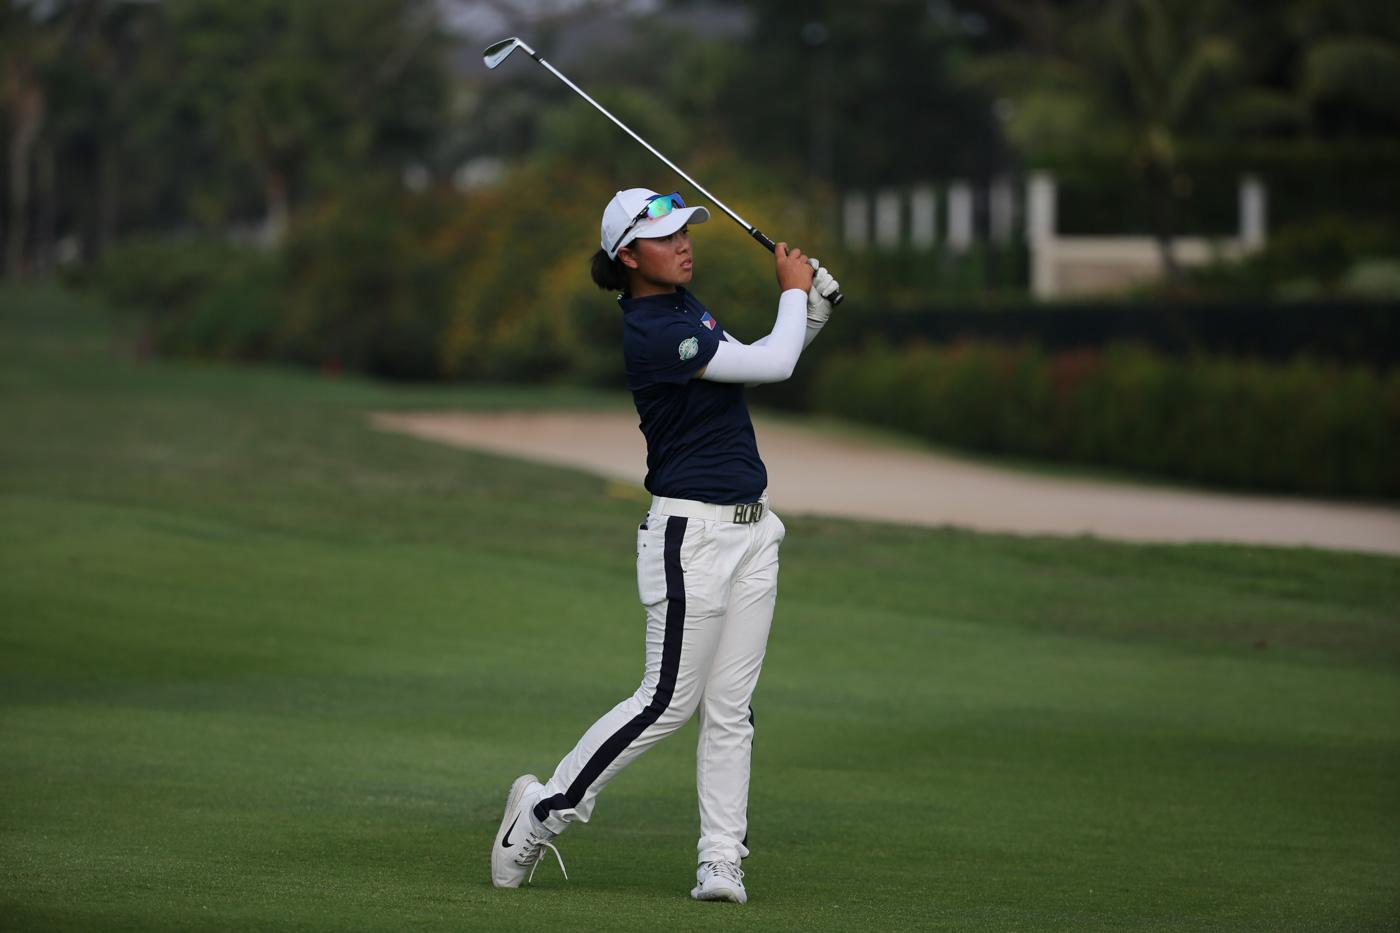 DRAMATIC. Yuka Saso rallies to win the Asiad women's golf gold. Photo by Adrian Portugal/Rappler